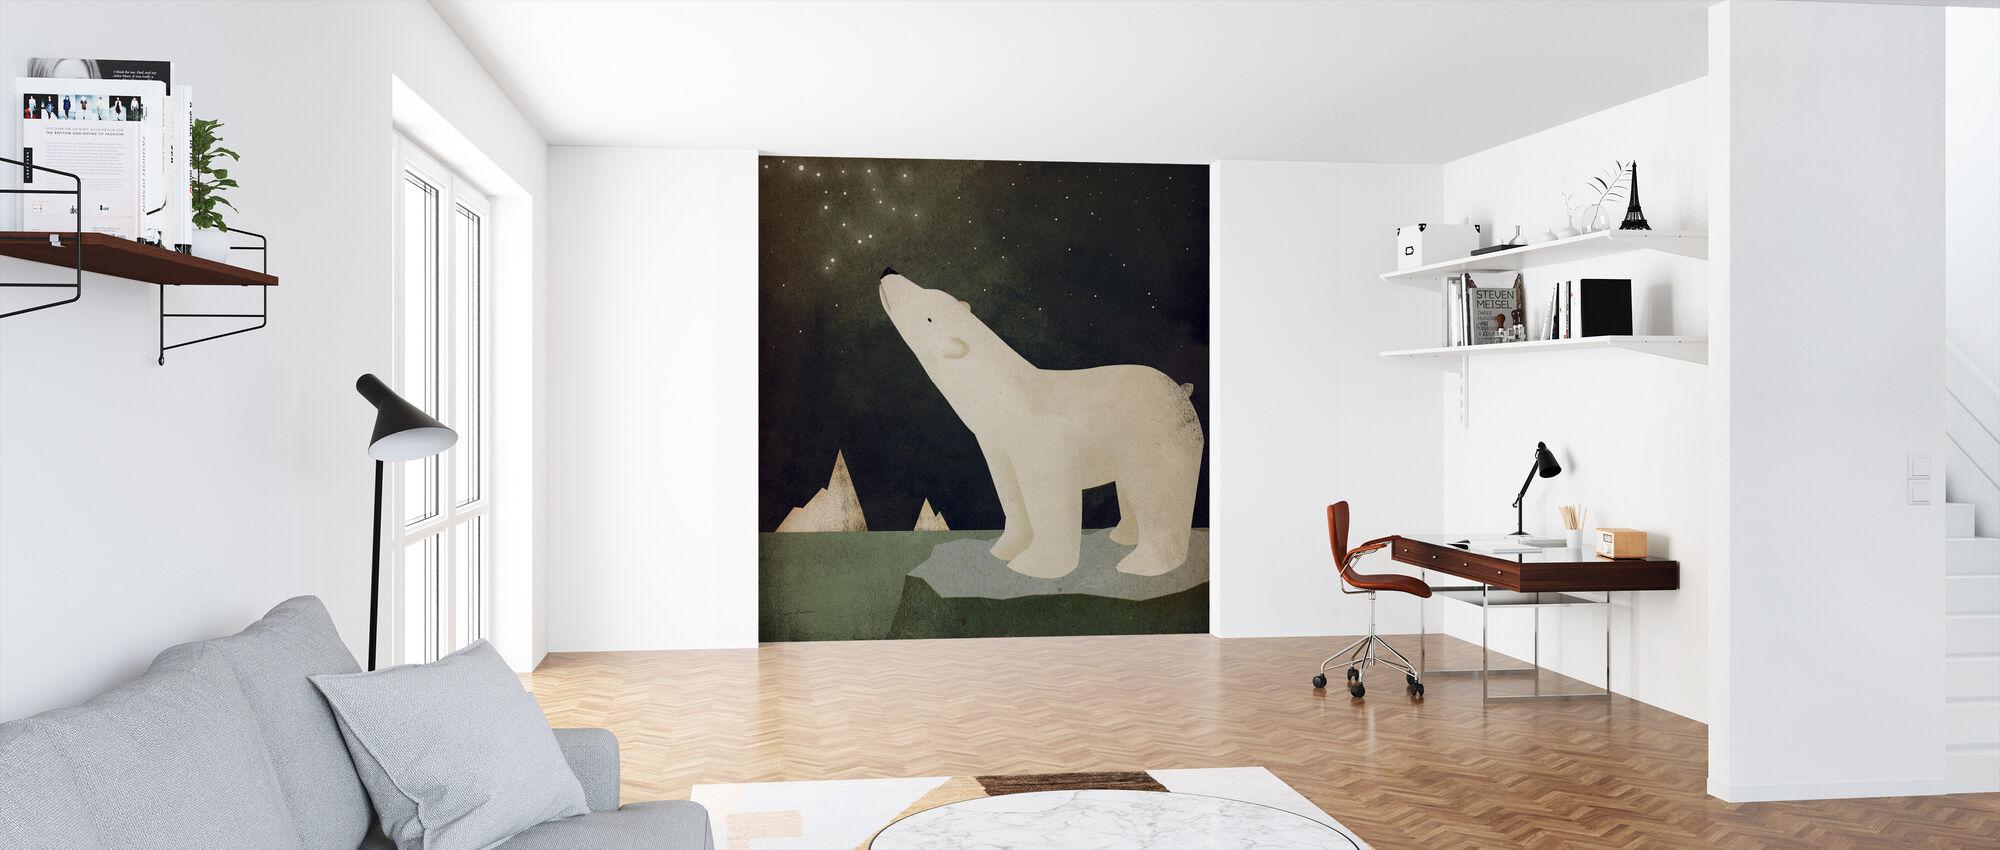 Konstelacje Niedźwiedź polarny - Tapeta - Biuro